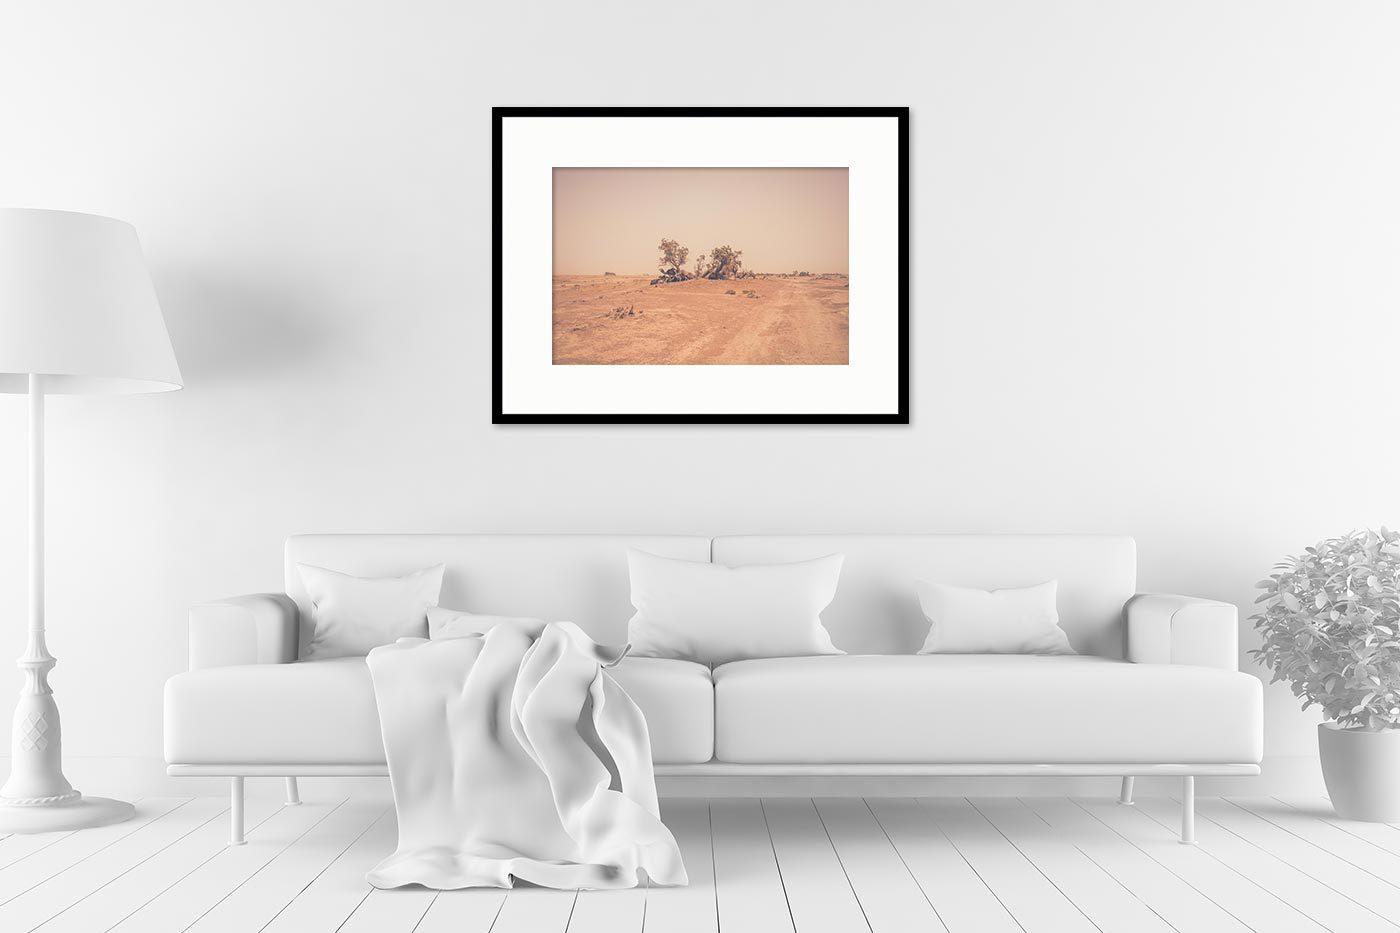 Cadre galerie 60x80 Camels Desert